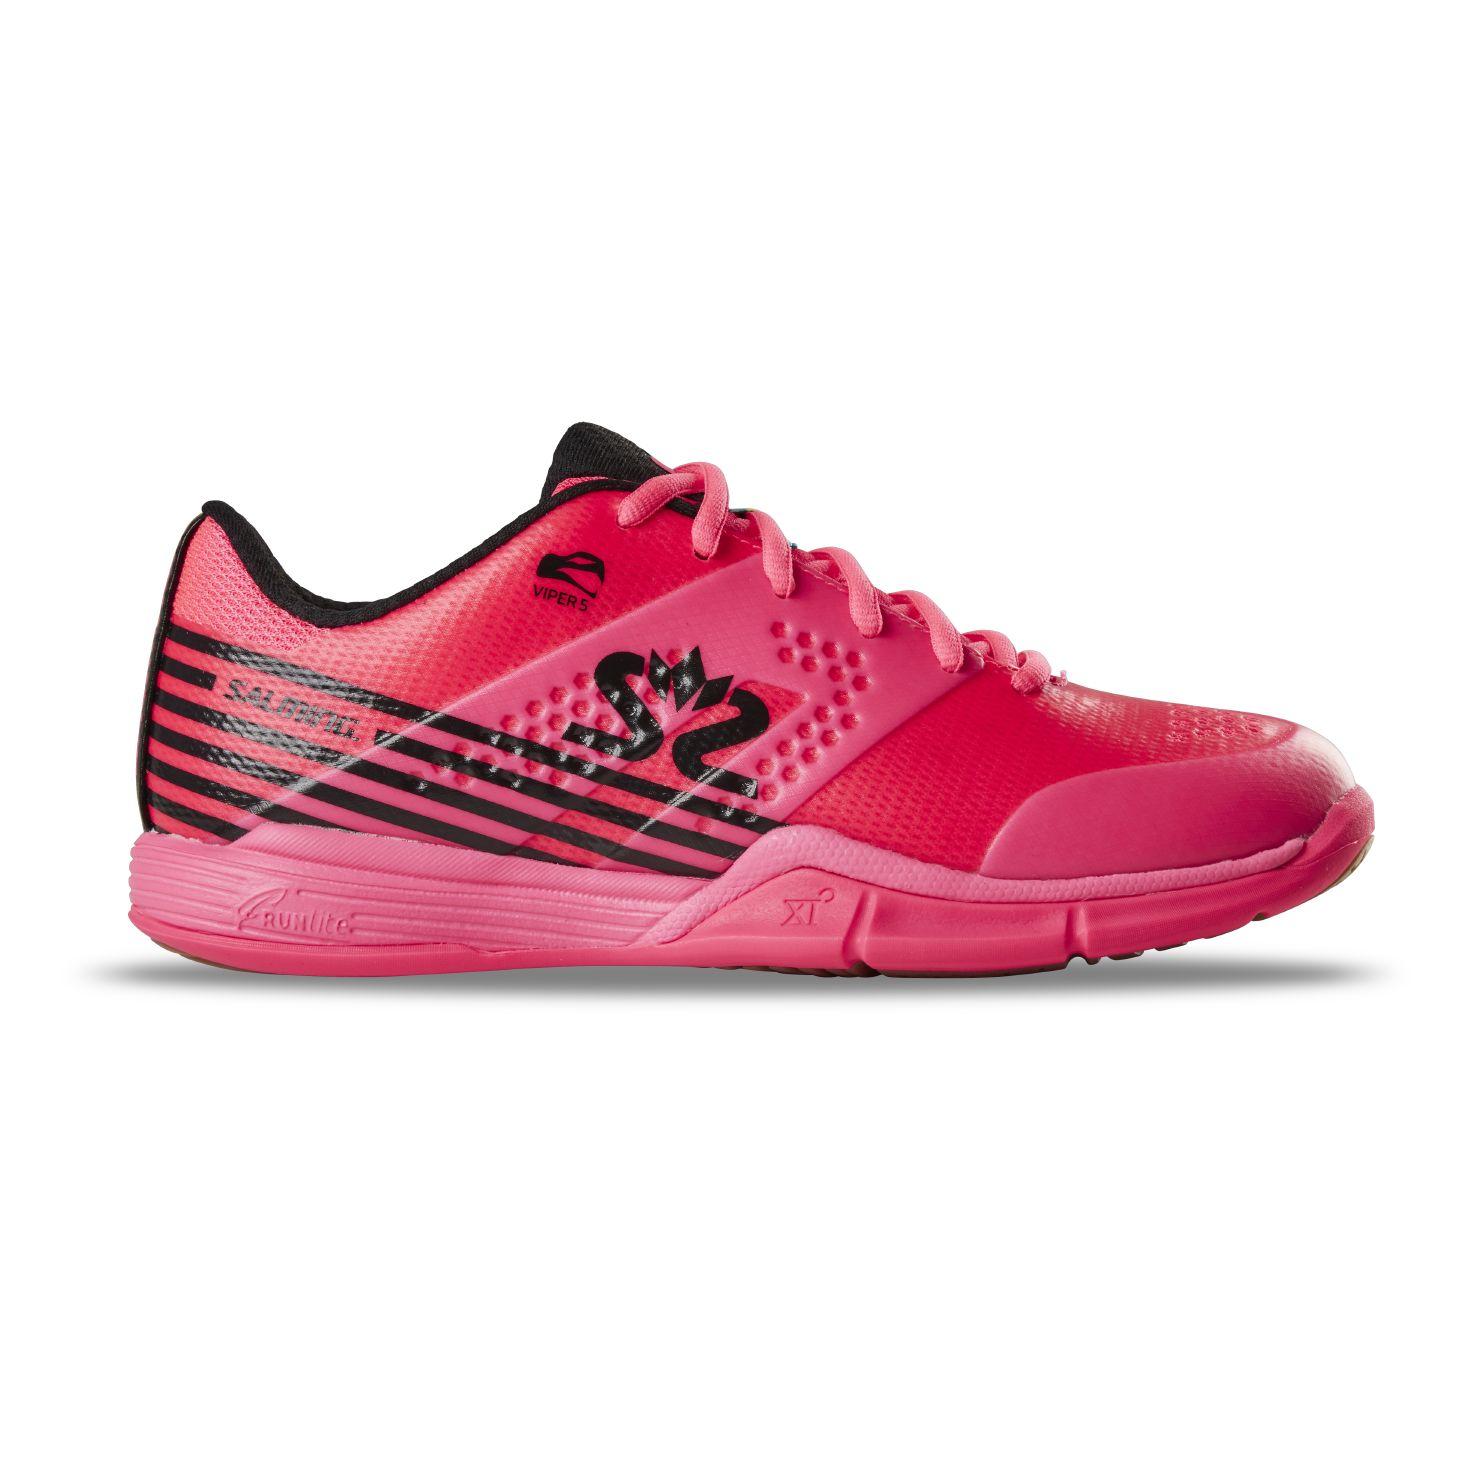 Salming Viper 5 Shoe Women Pink/Black 8 UK - 42 EUR - 27 cm